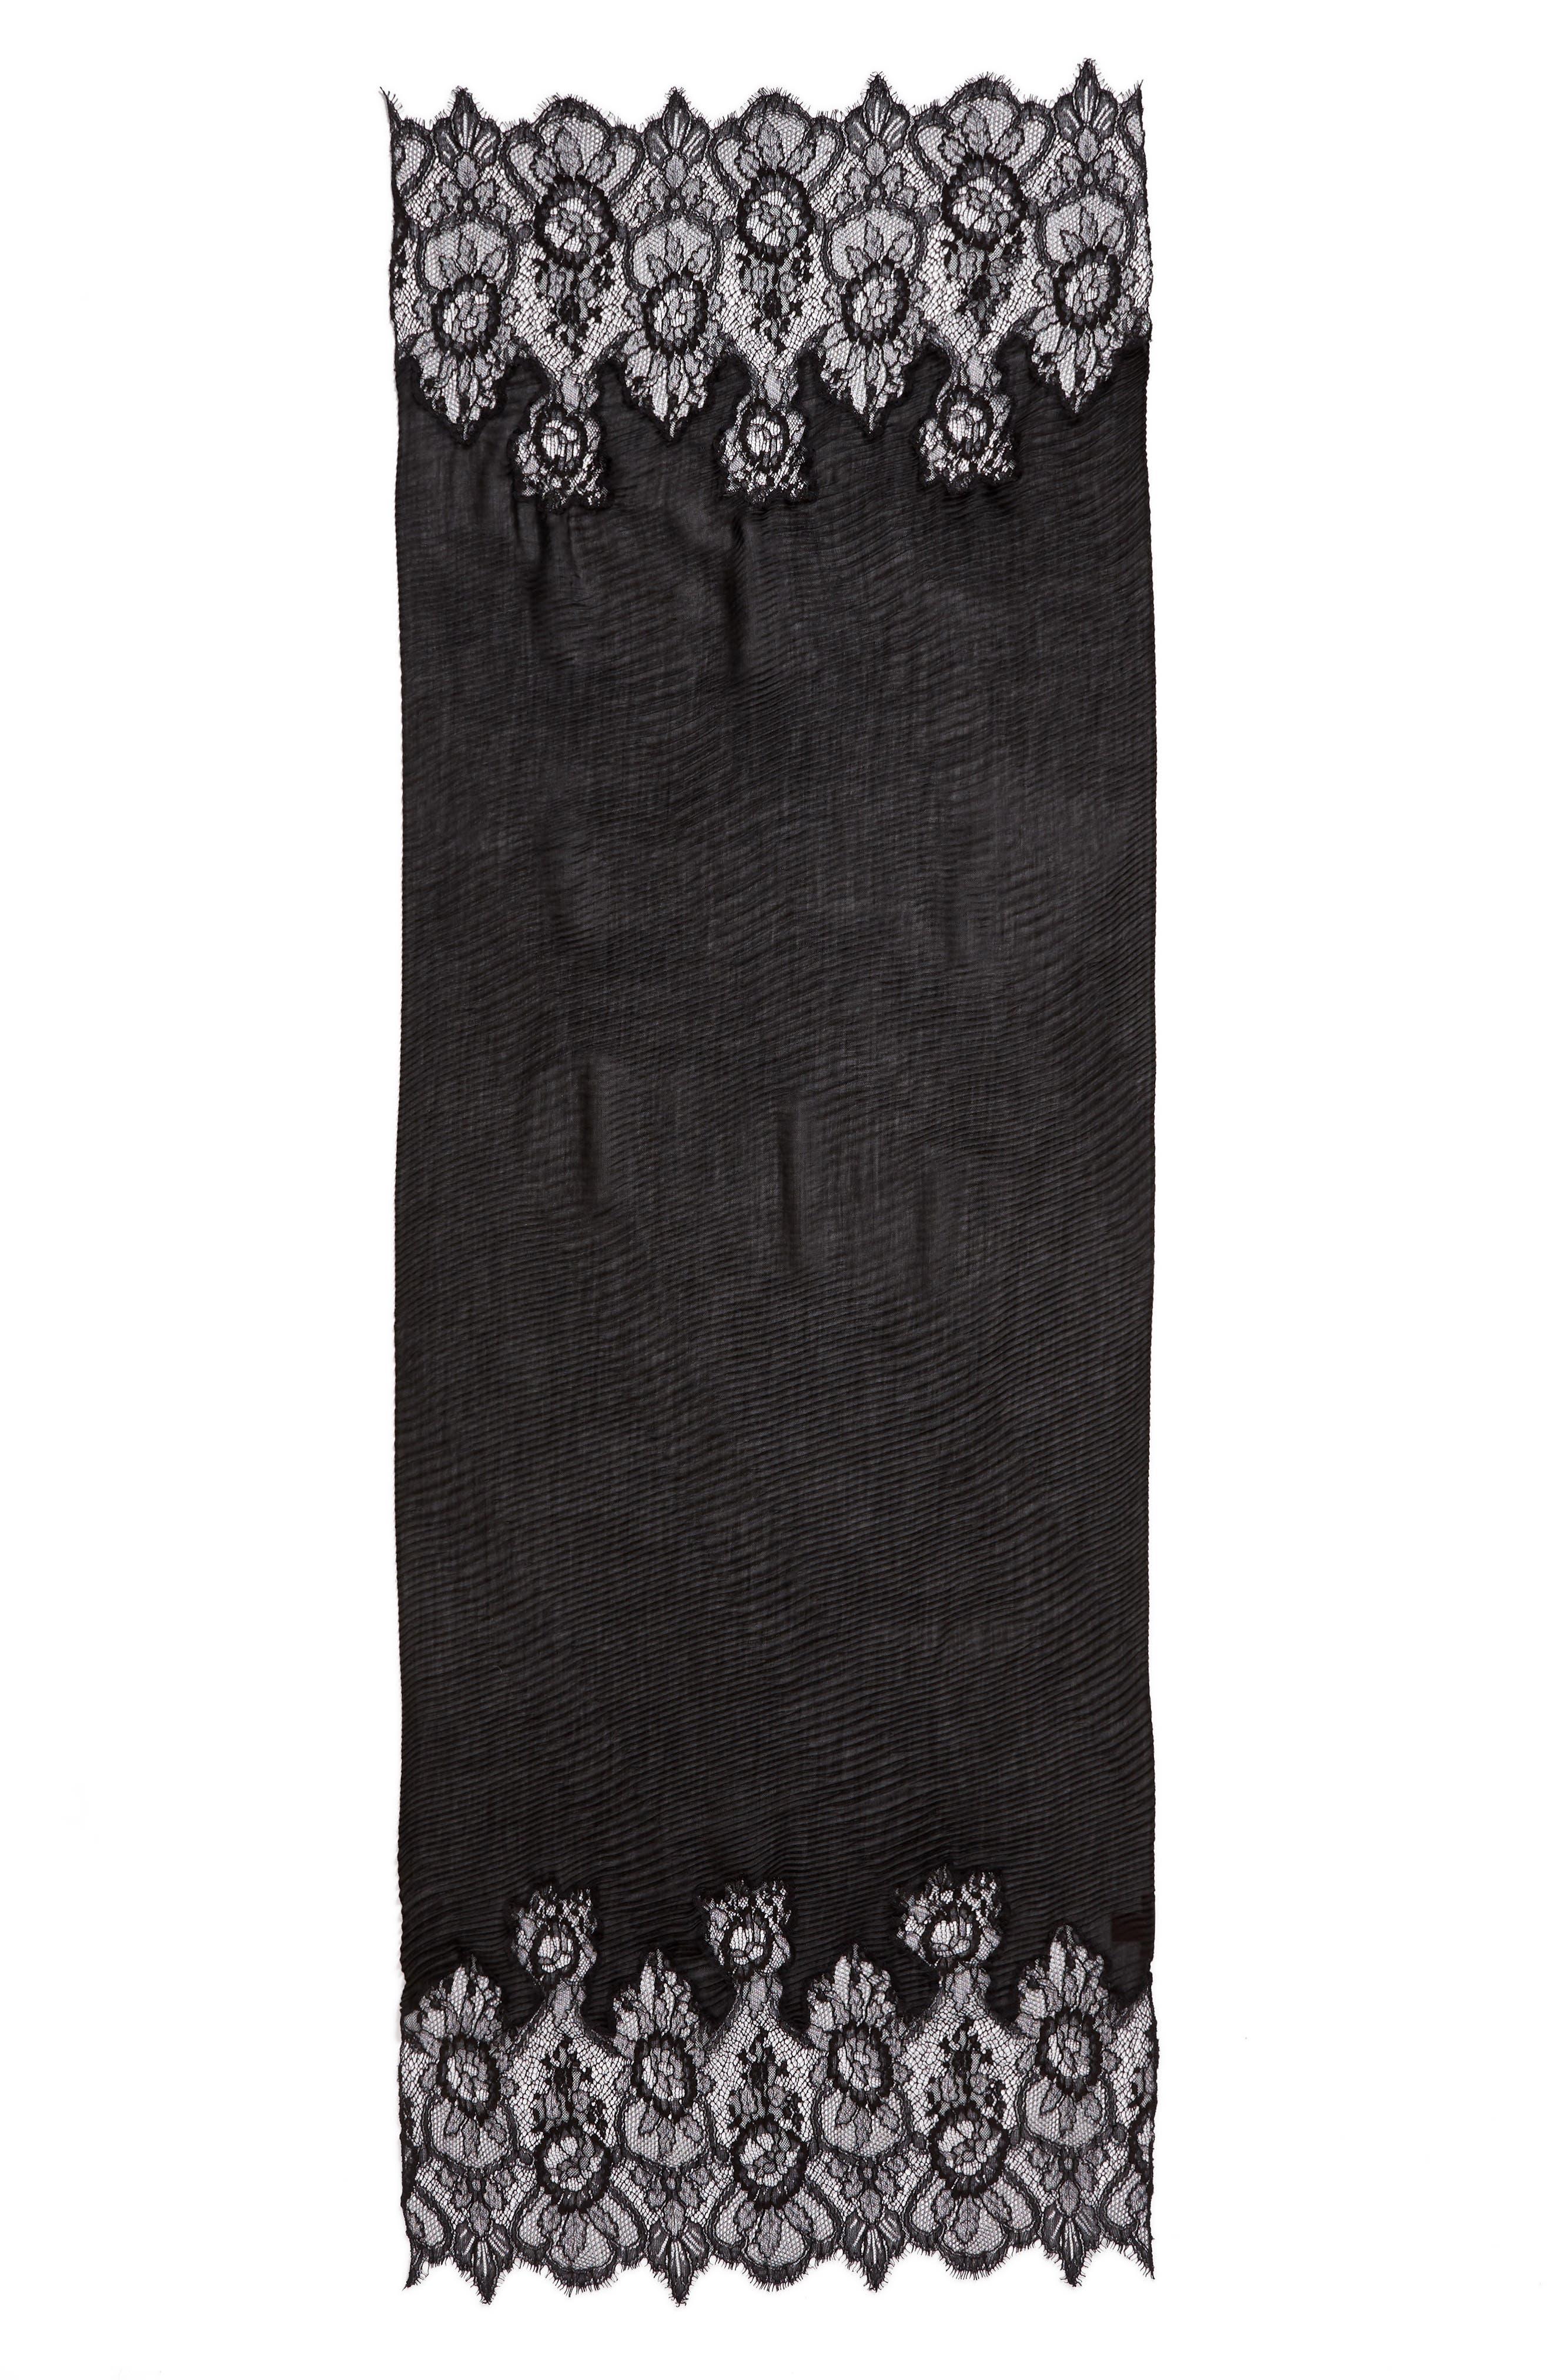 VALENTINO,                             Cashmere & Wool Wrap,                             Main thumbnail 1, color,                             NERO/ NERO